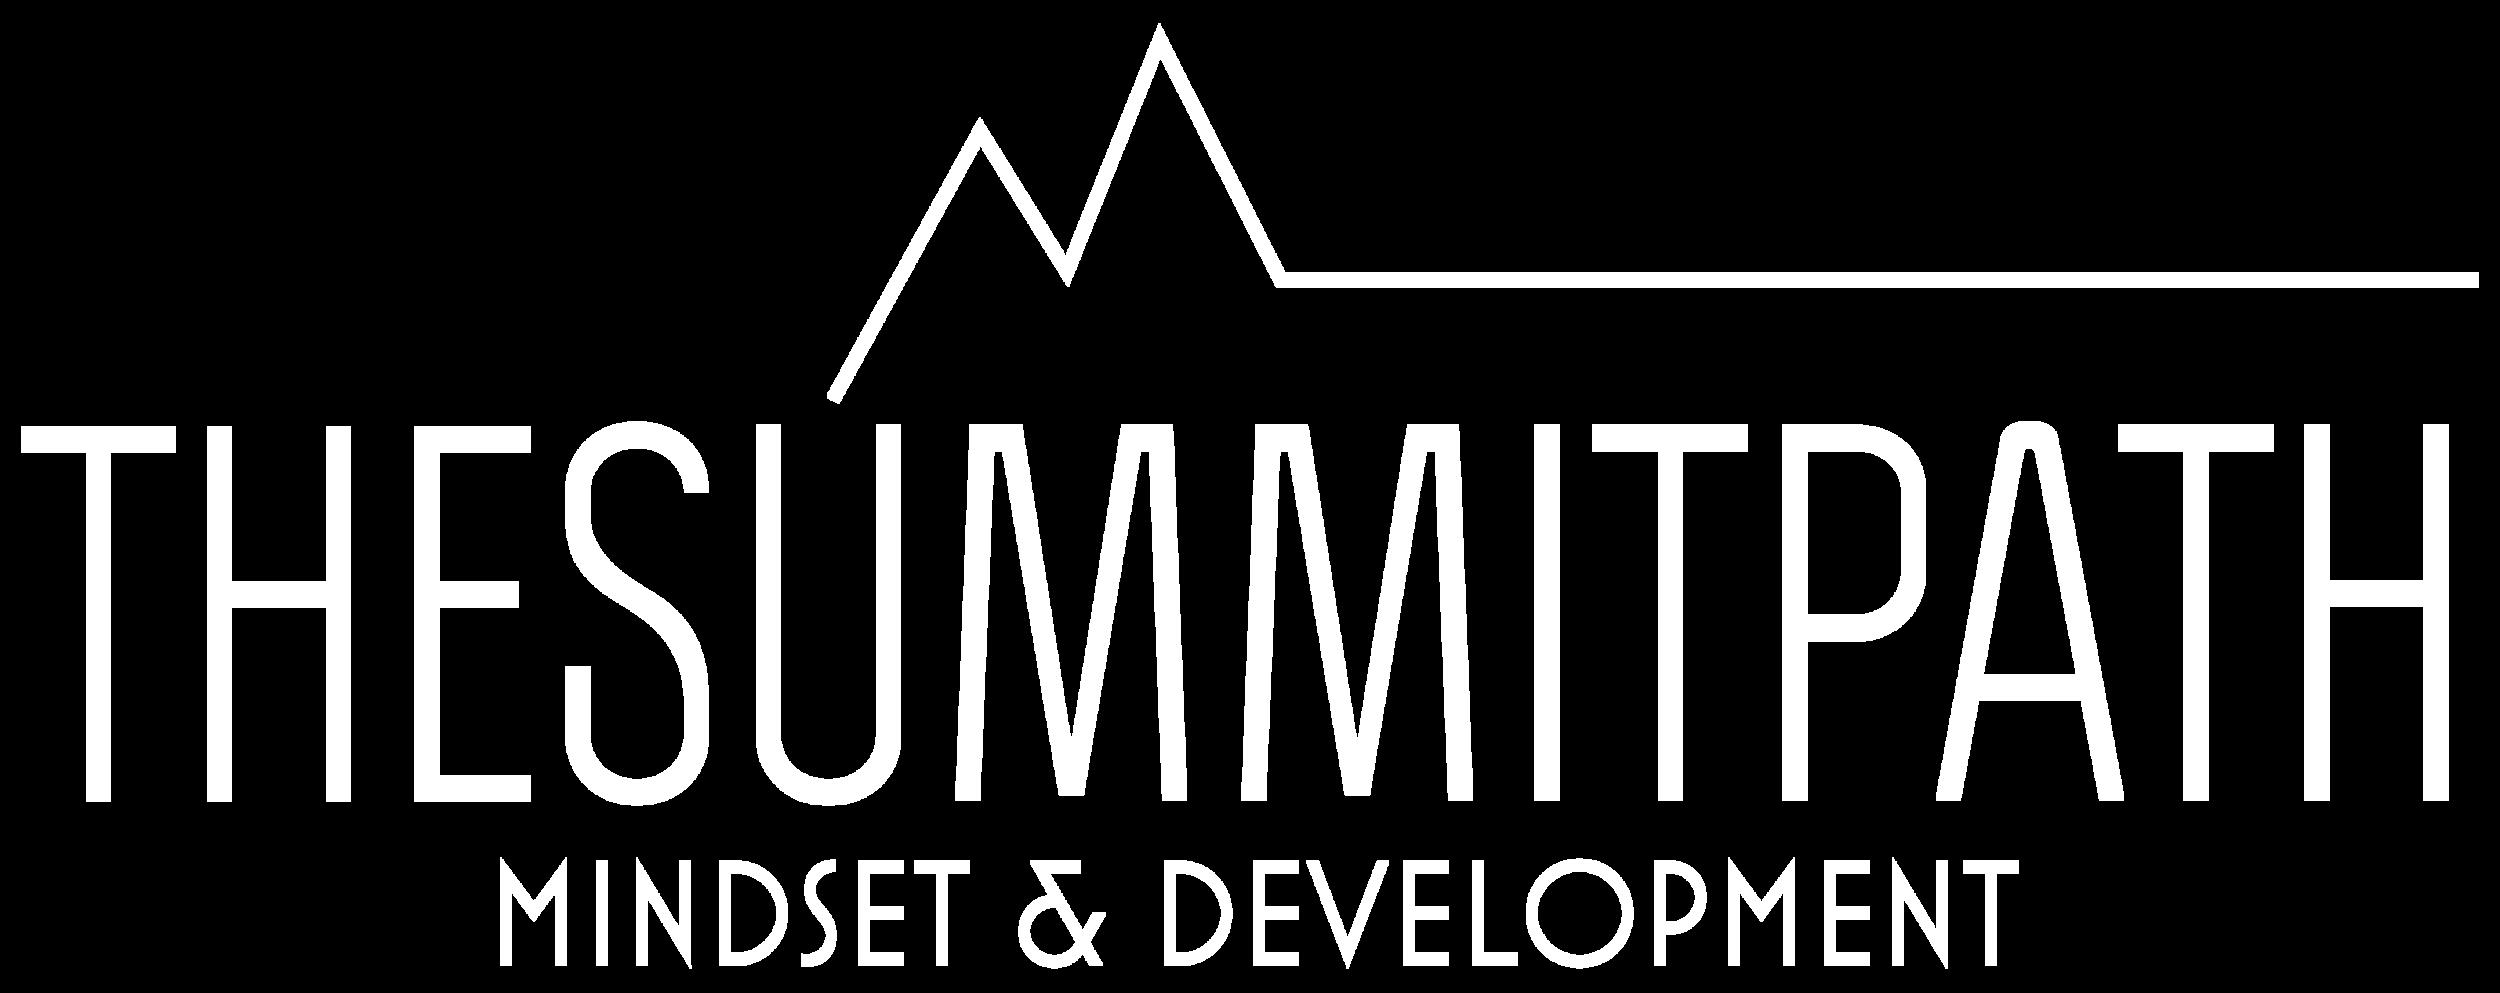 TheSummitPath_Logo-Mindset&Develop_white.jpeg